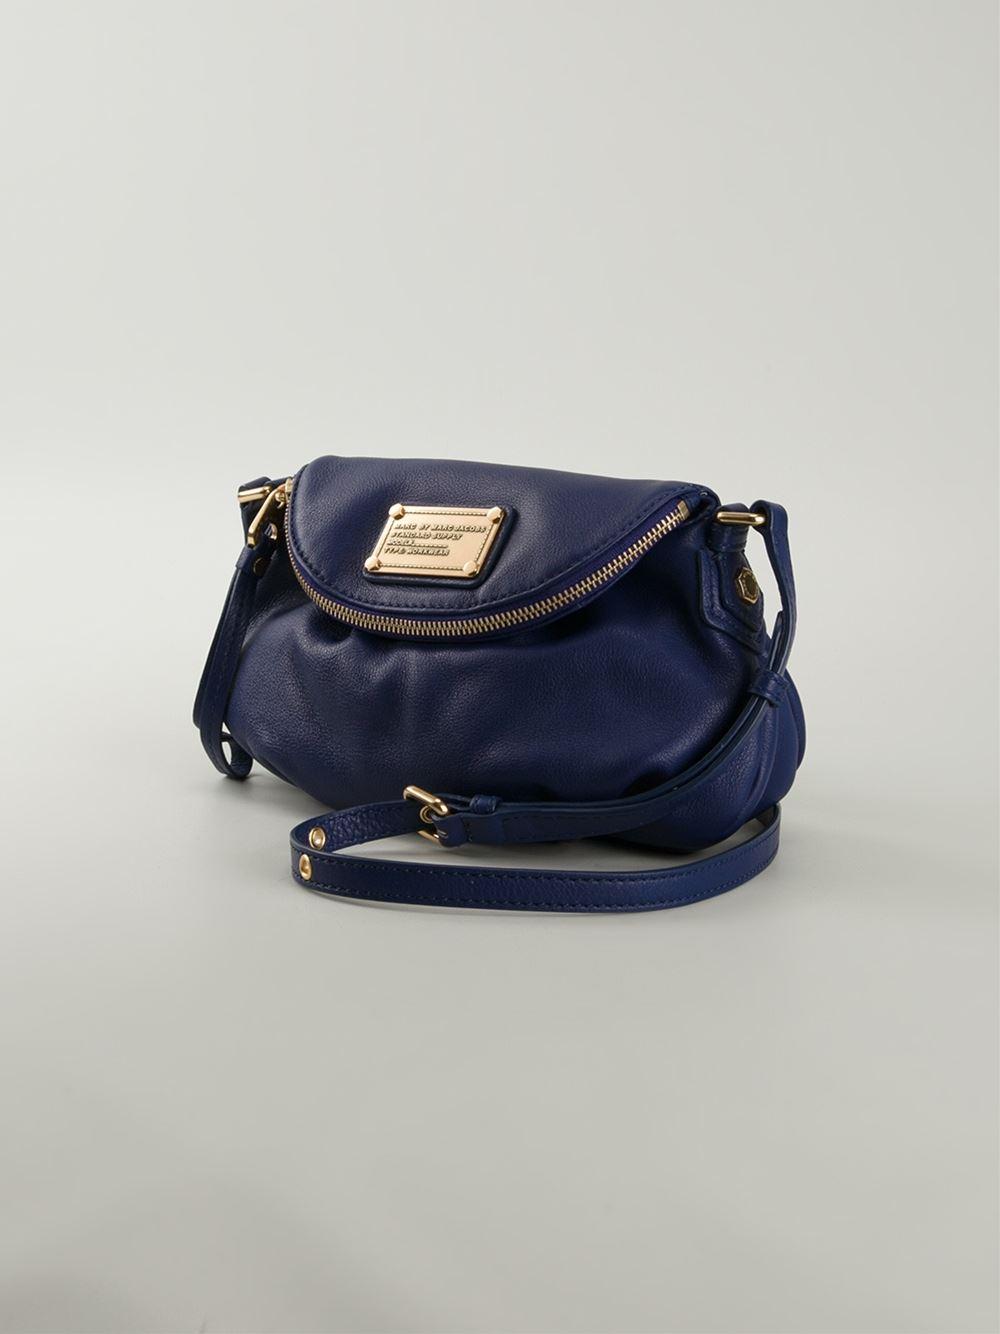 71a4980fa607 Lyst Marc By Jacobs Clic Q Mini Natasha Crossbody Bag In